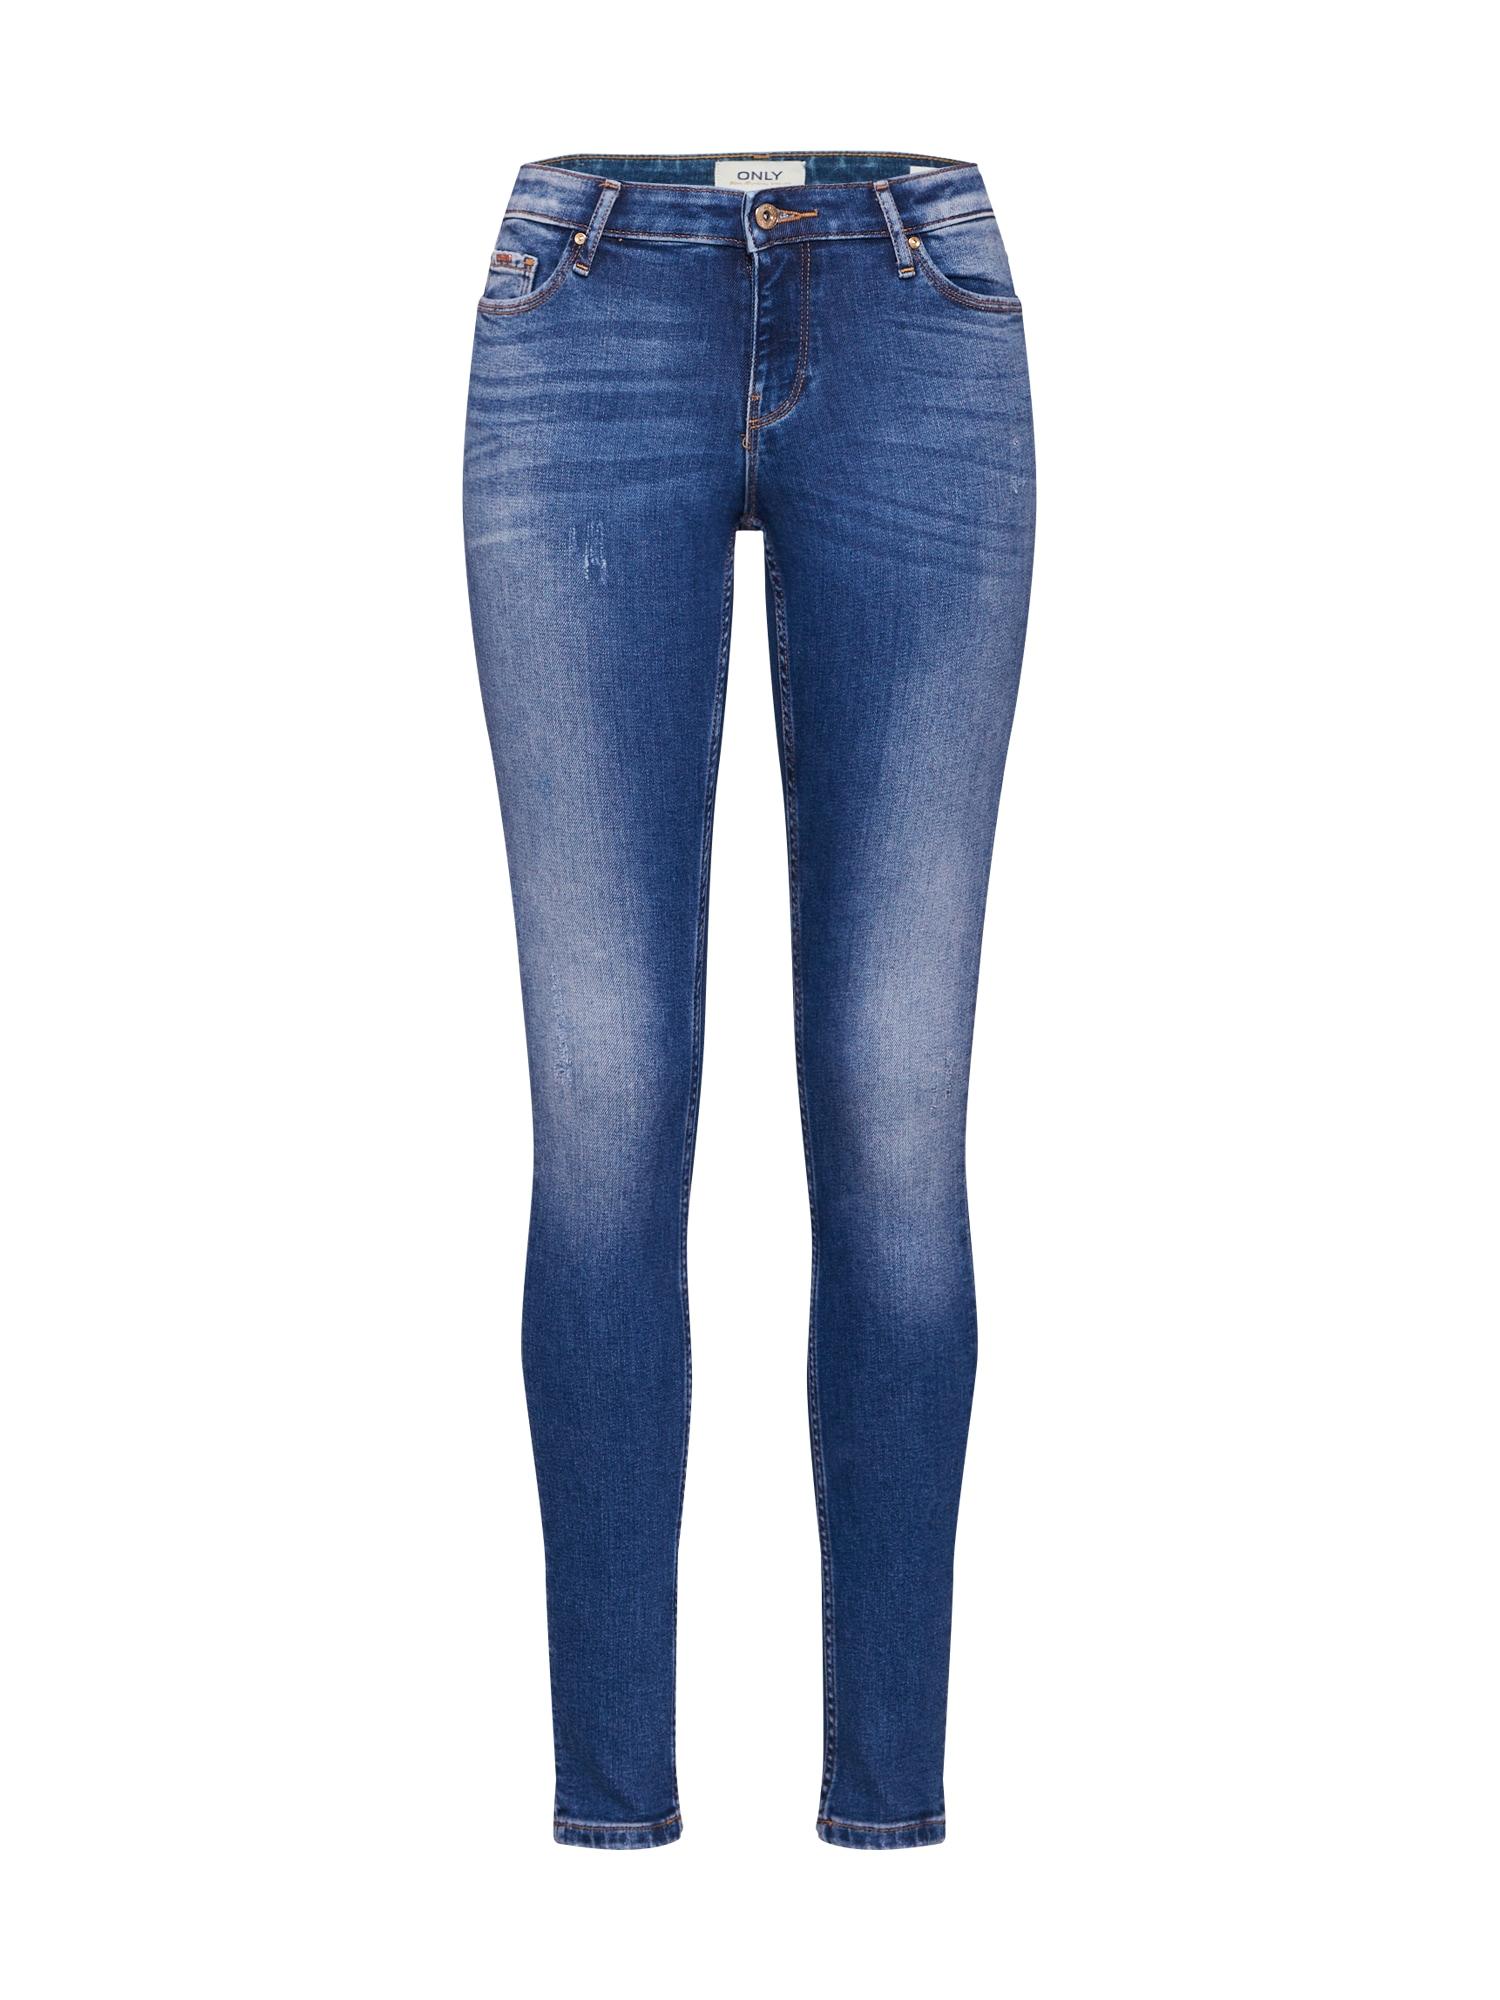 Jeans   Bekleidung > Jeans > Sonstige Jeans   Only